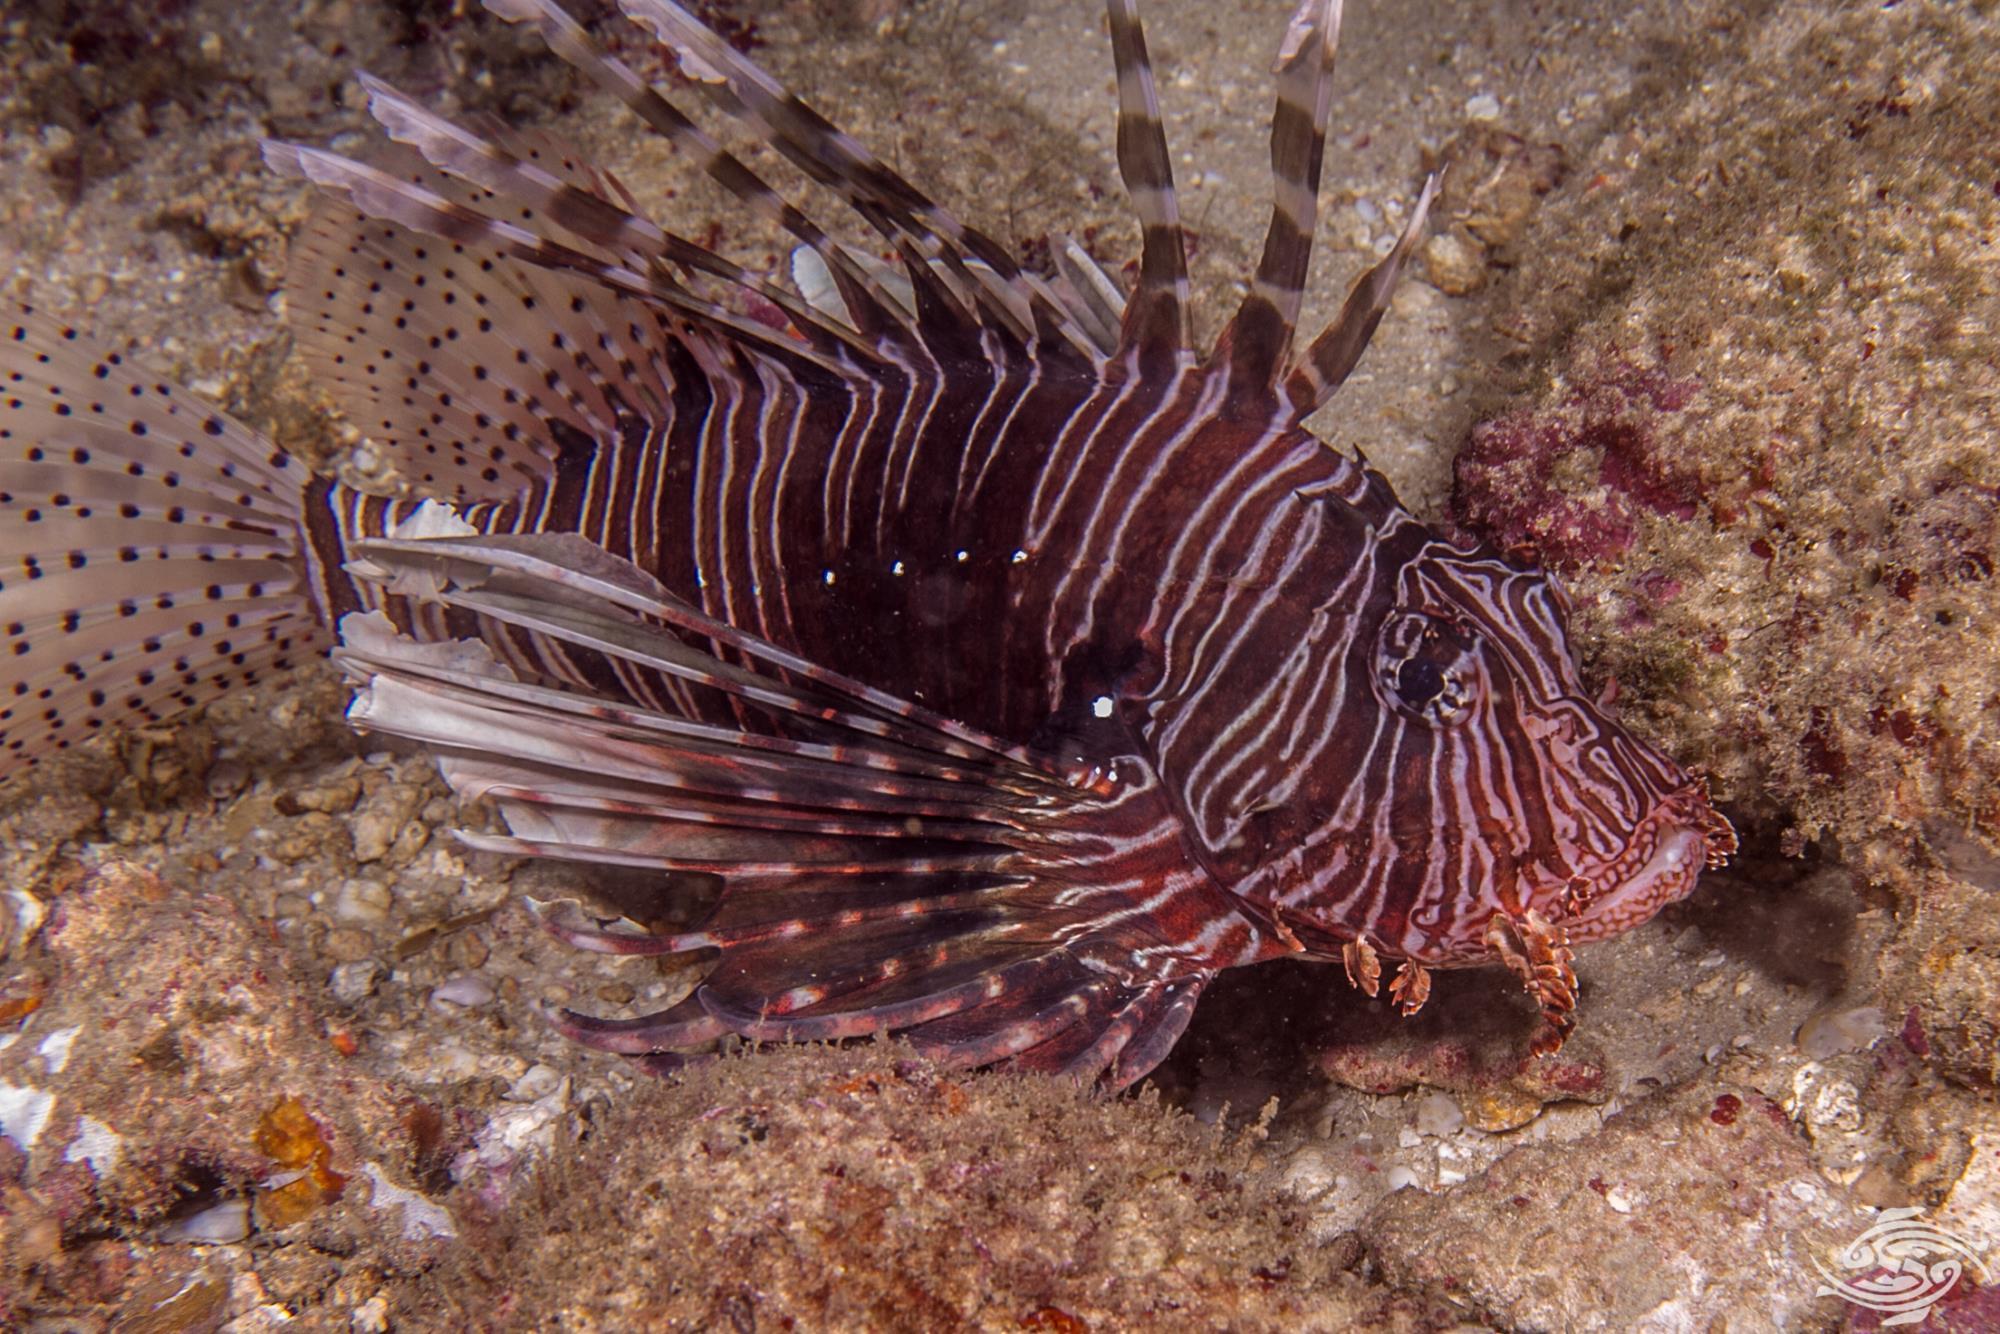 Common Lionfish, Indian Lionfish or Devil Firefish (Pterois miles)